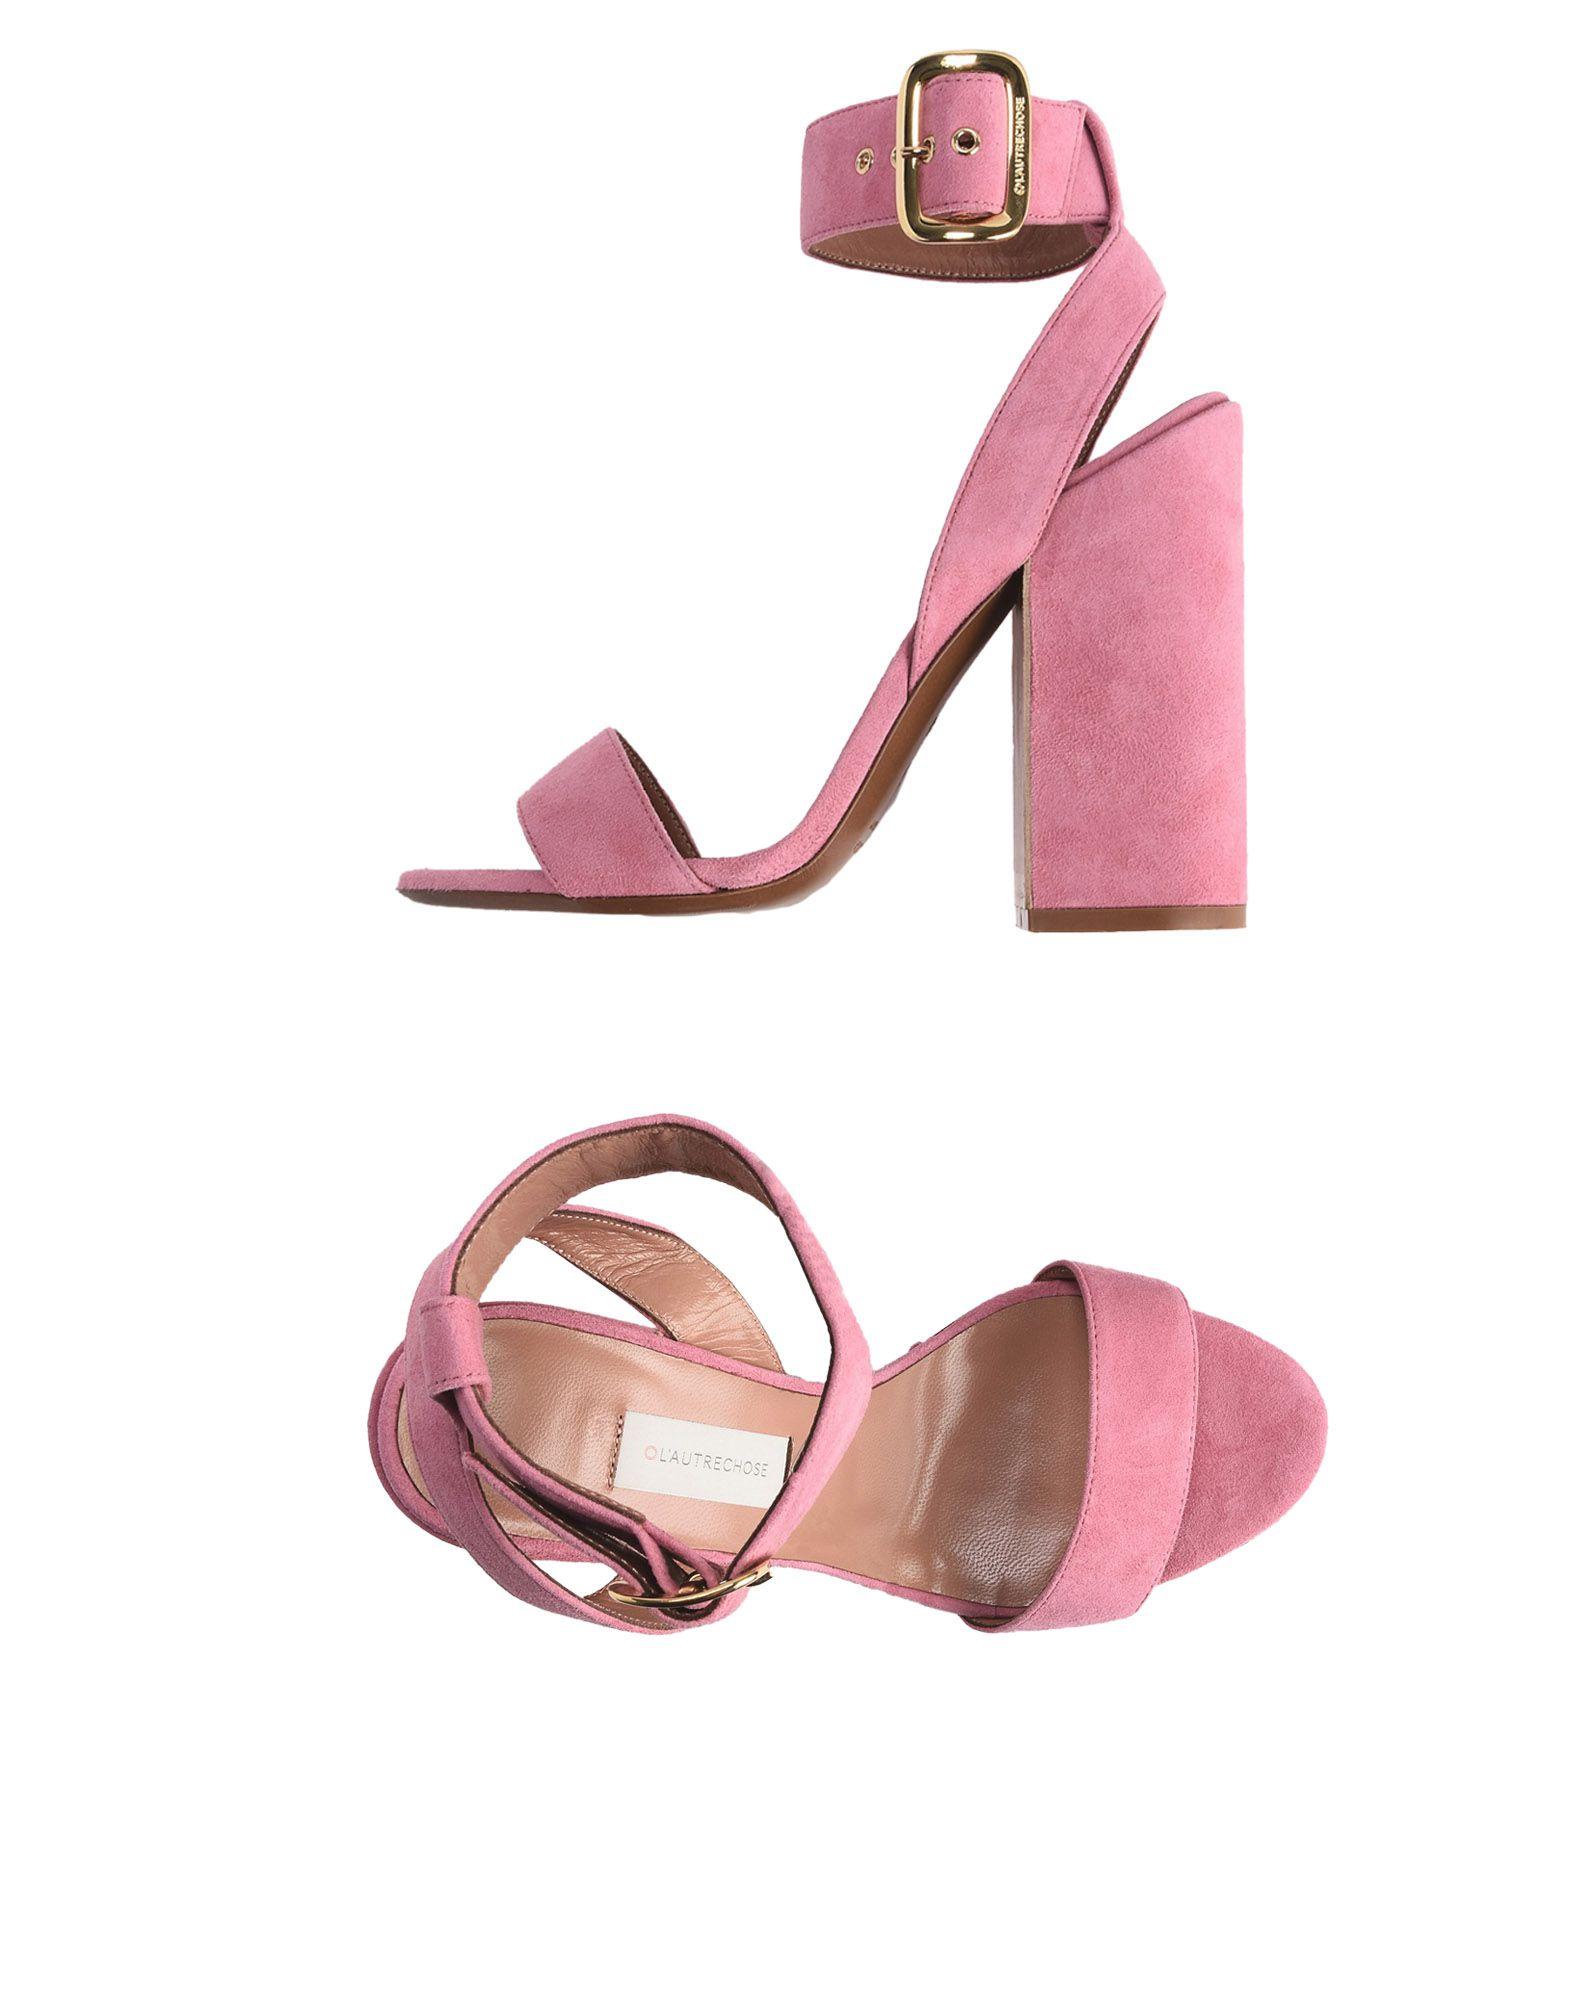 L' Autre Chose Sandalen Damen Schuhe  11383788WN Neue Schuhe Damen e92aa8